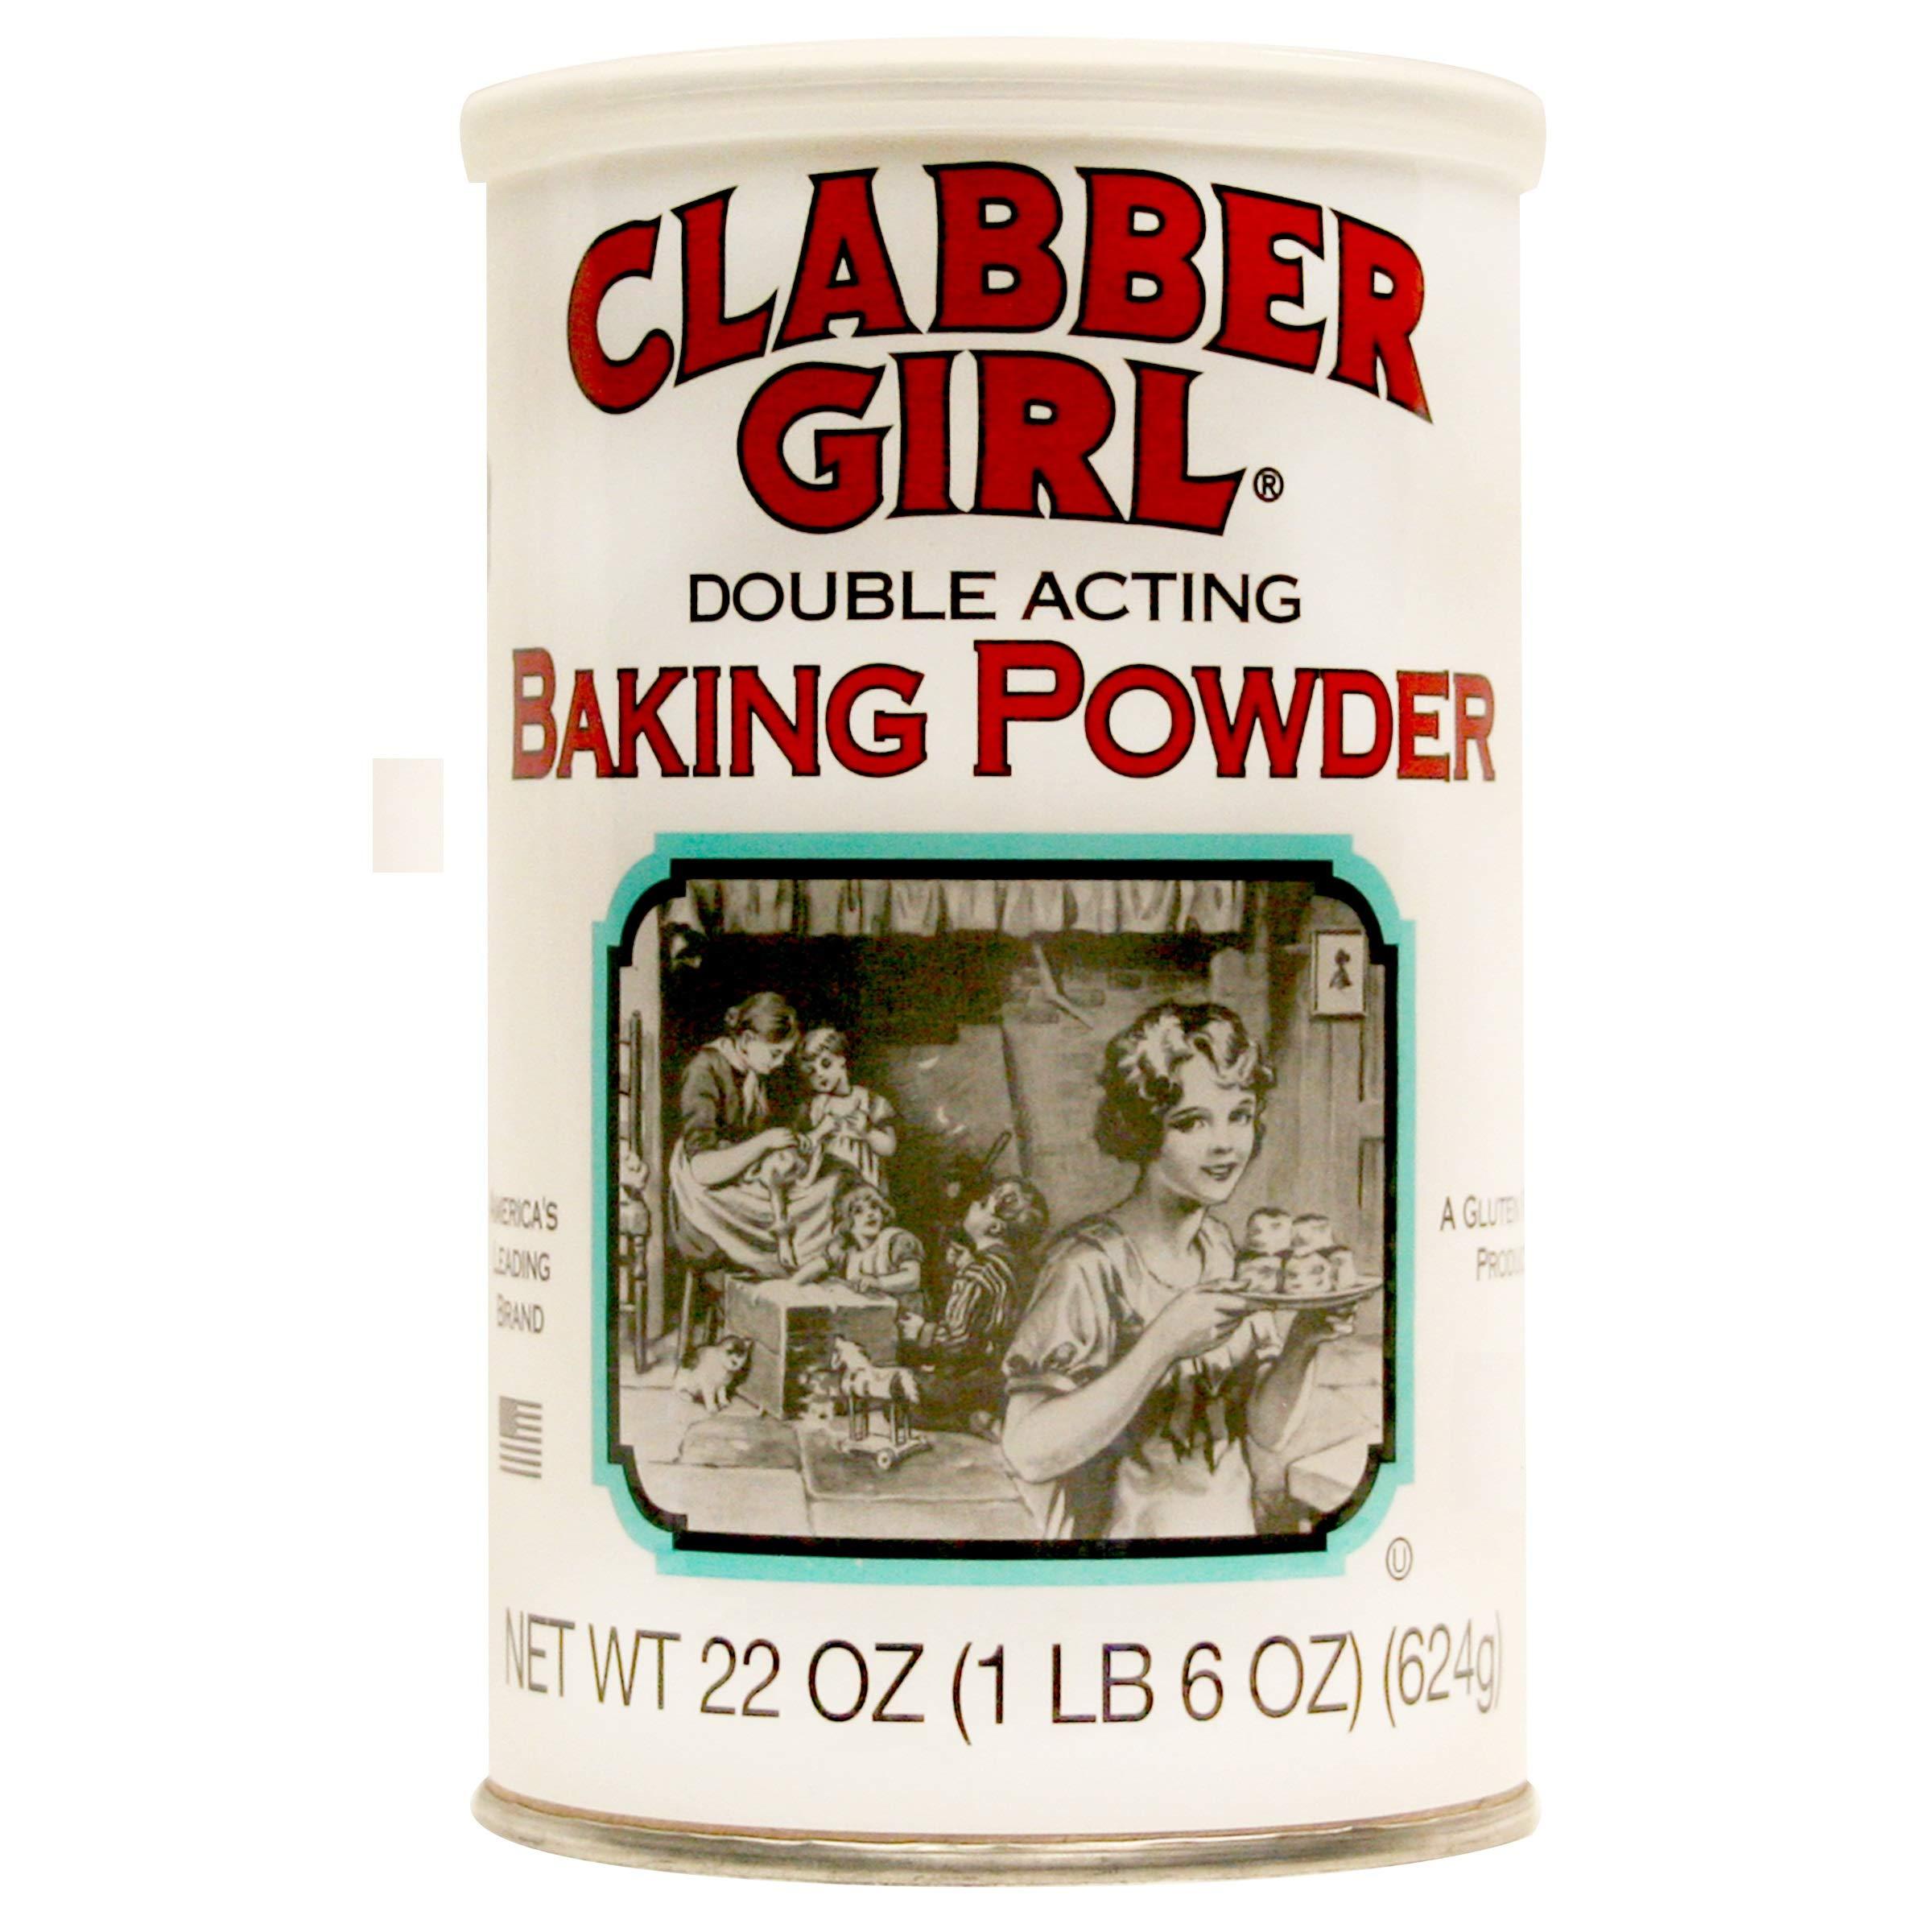 Clabber Girl Baking Powder 22 oz can (4)